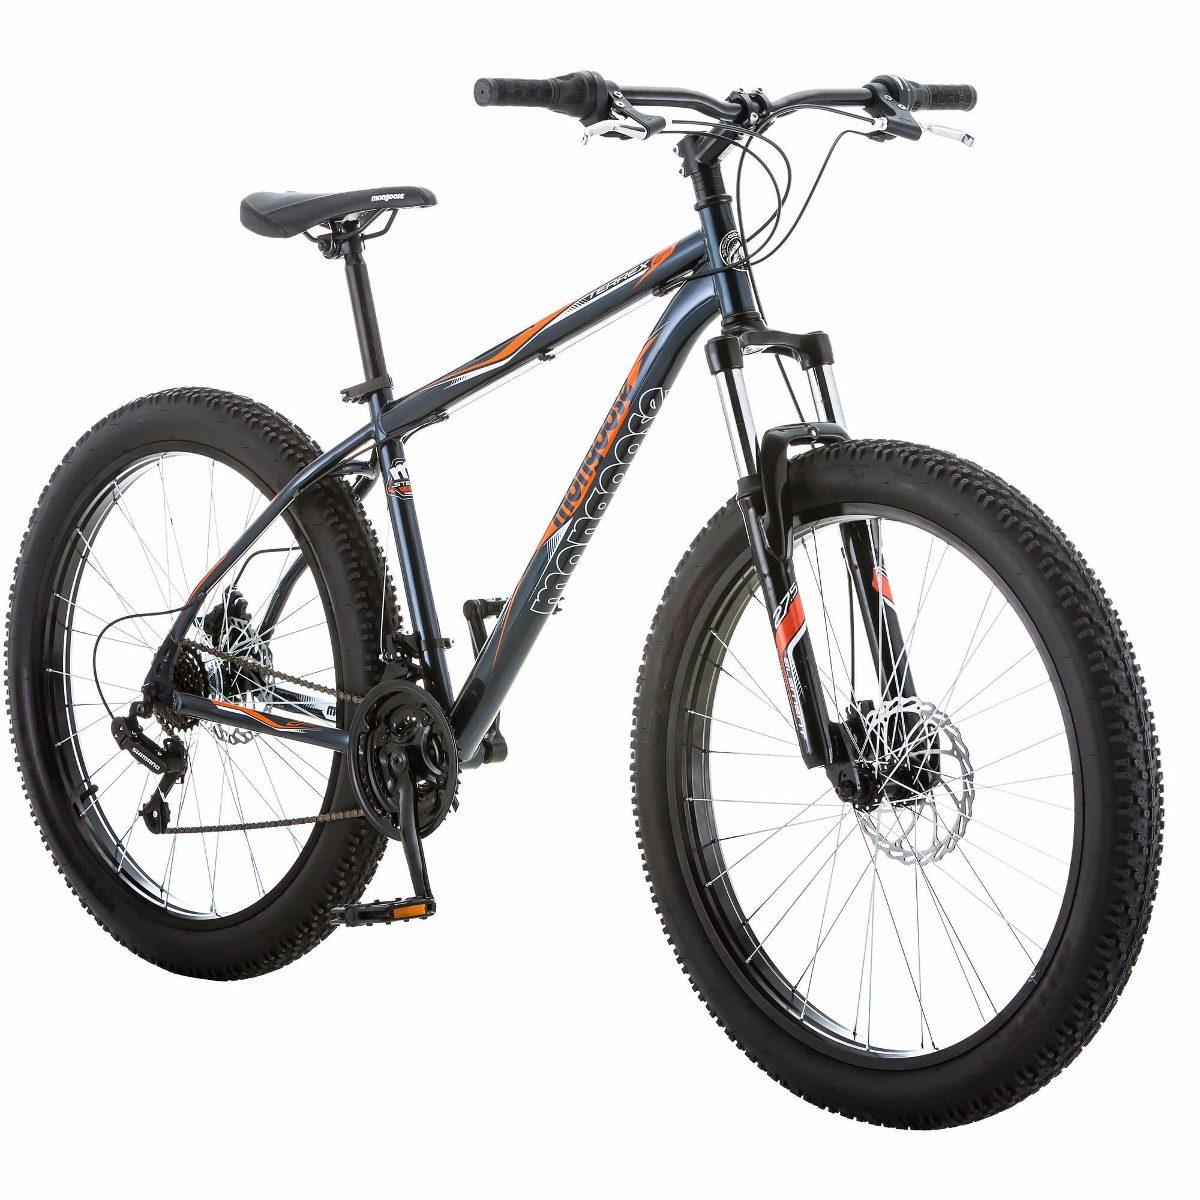 Bicicleta Rodada 27 5 Mongoose Terrex Fat 2 8 7 150 00